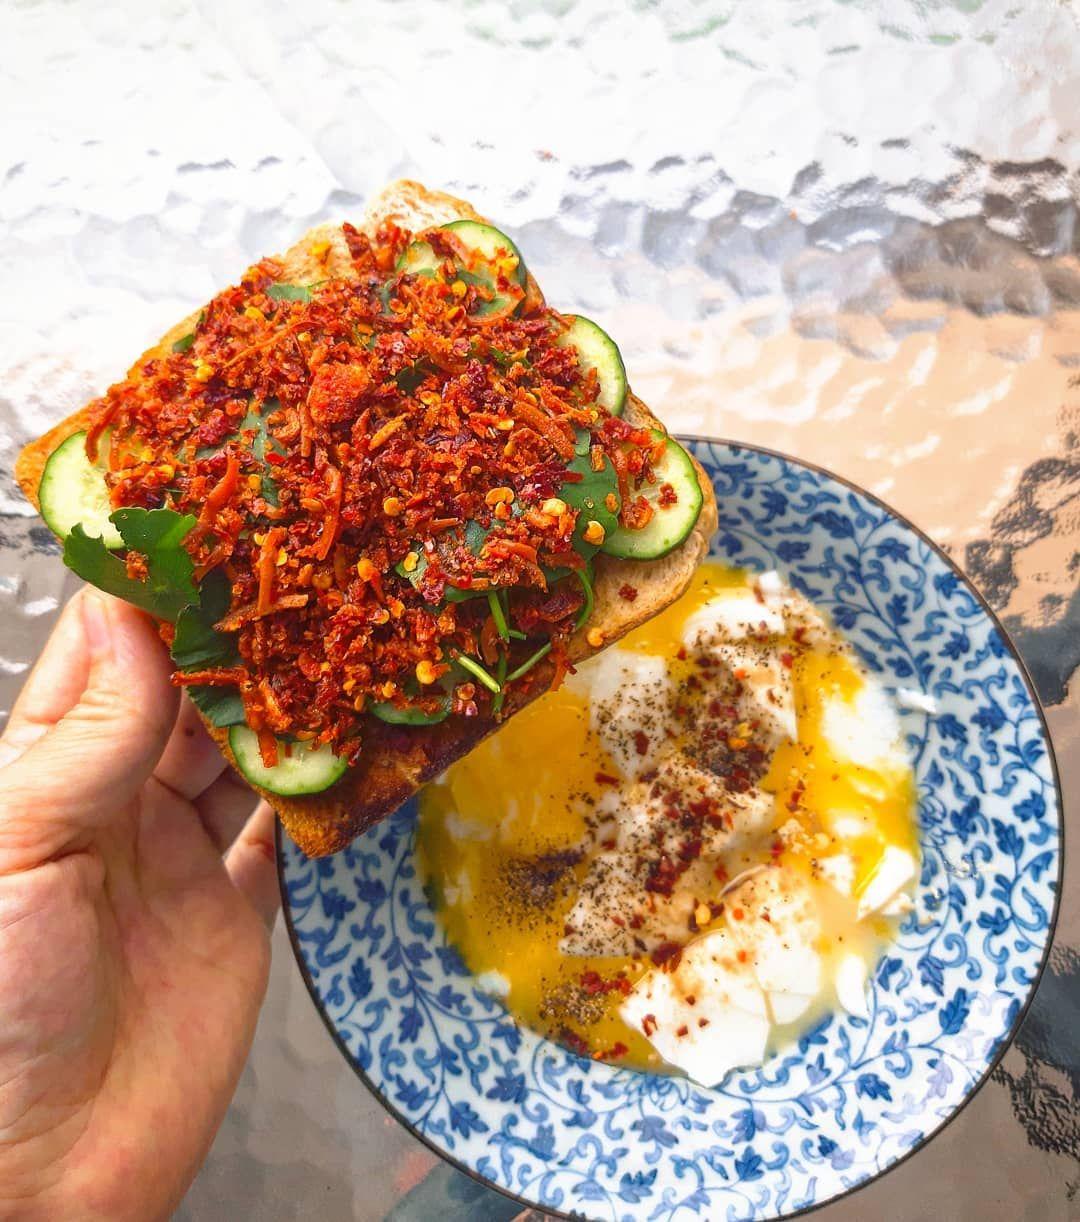 Terasa Nak Makan 1 Keping Roti Wholemeal Bakar Dengan Sambal Bilis Guna Karachi Bilis Salad X De No Hal Kita Letak Timun Je Avocado Toast Food Avocado Egg